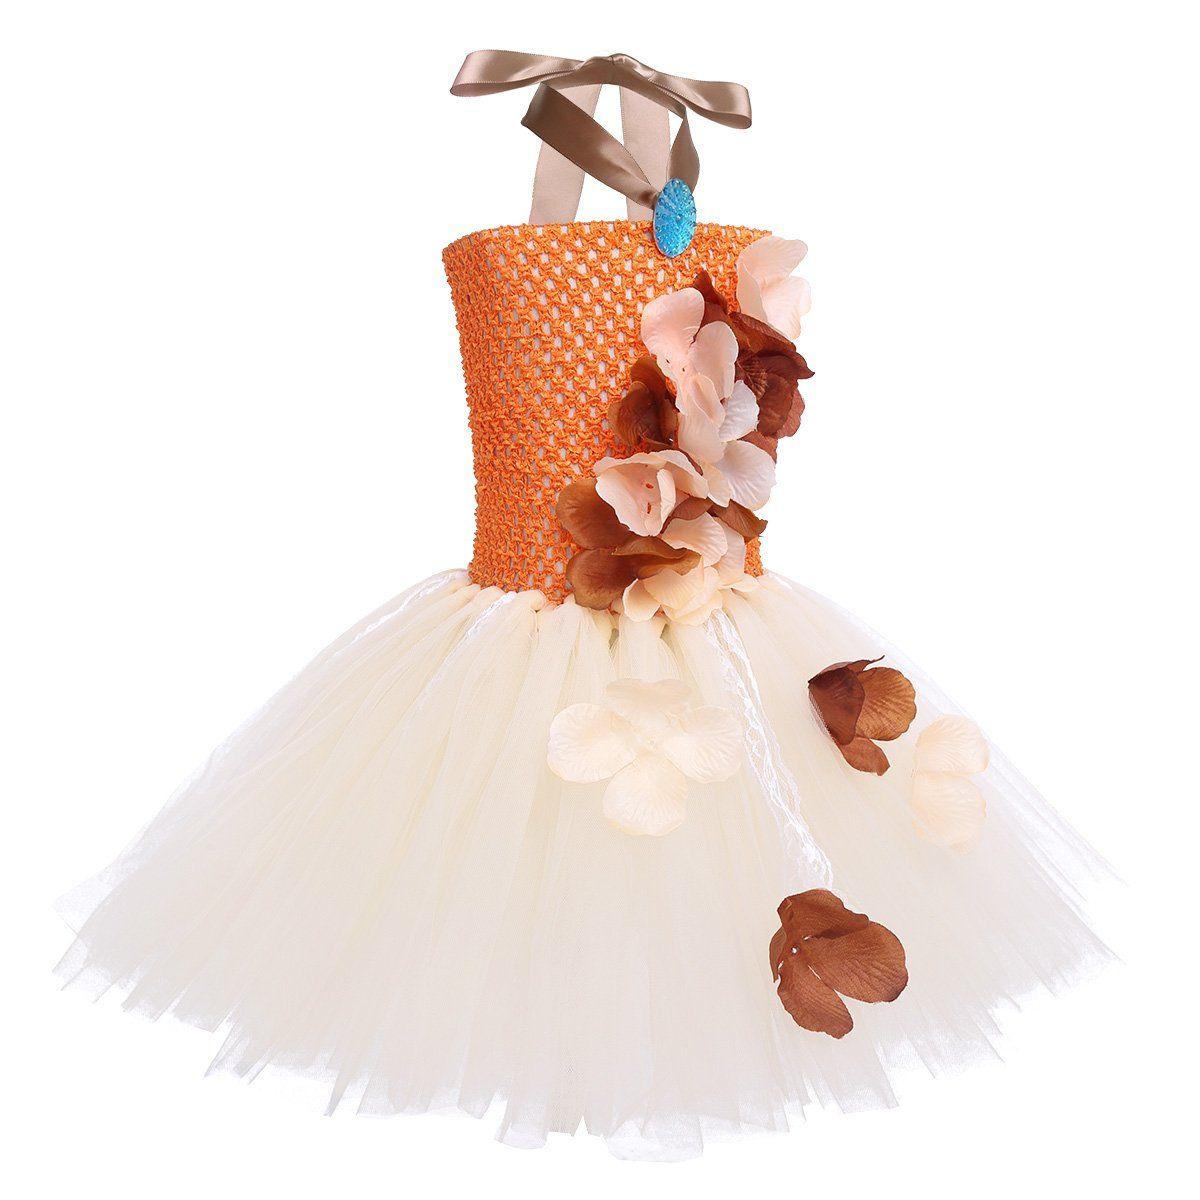 Kid Girls Halter 3D Flower Tutu Dress Princess Outfit Costumes Halloween Party